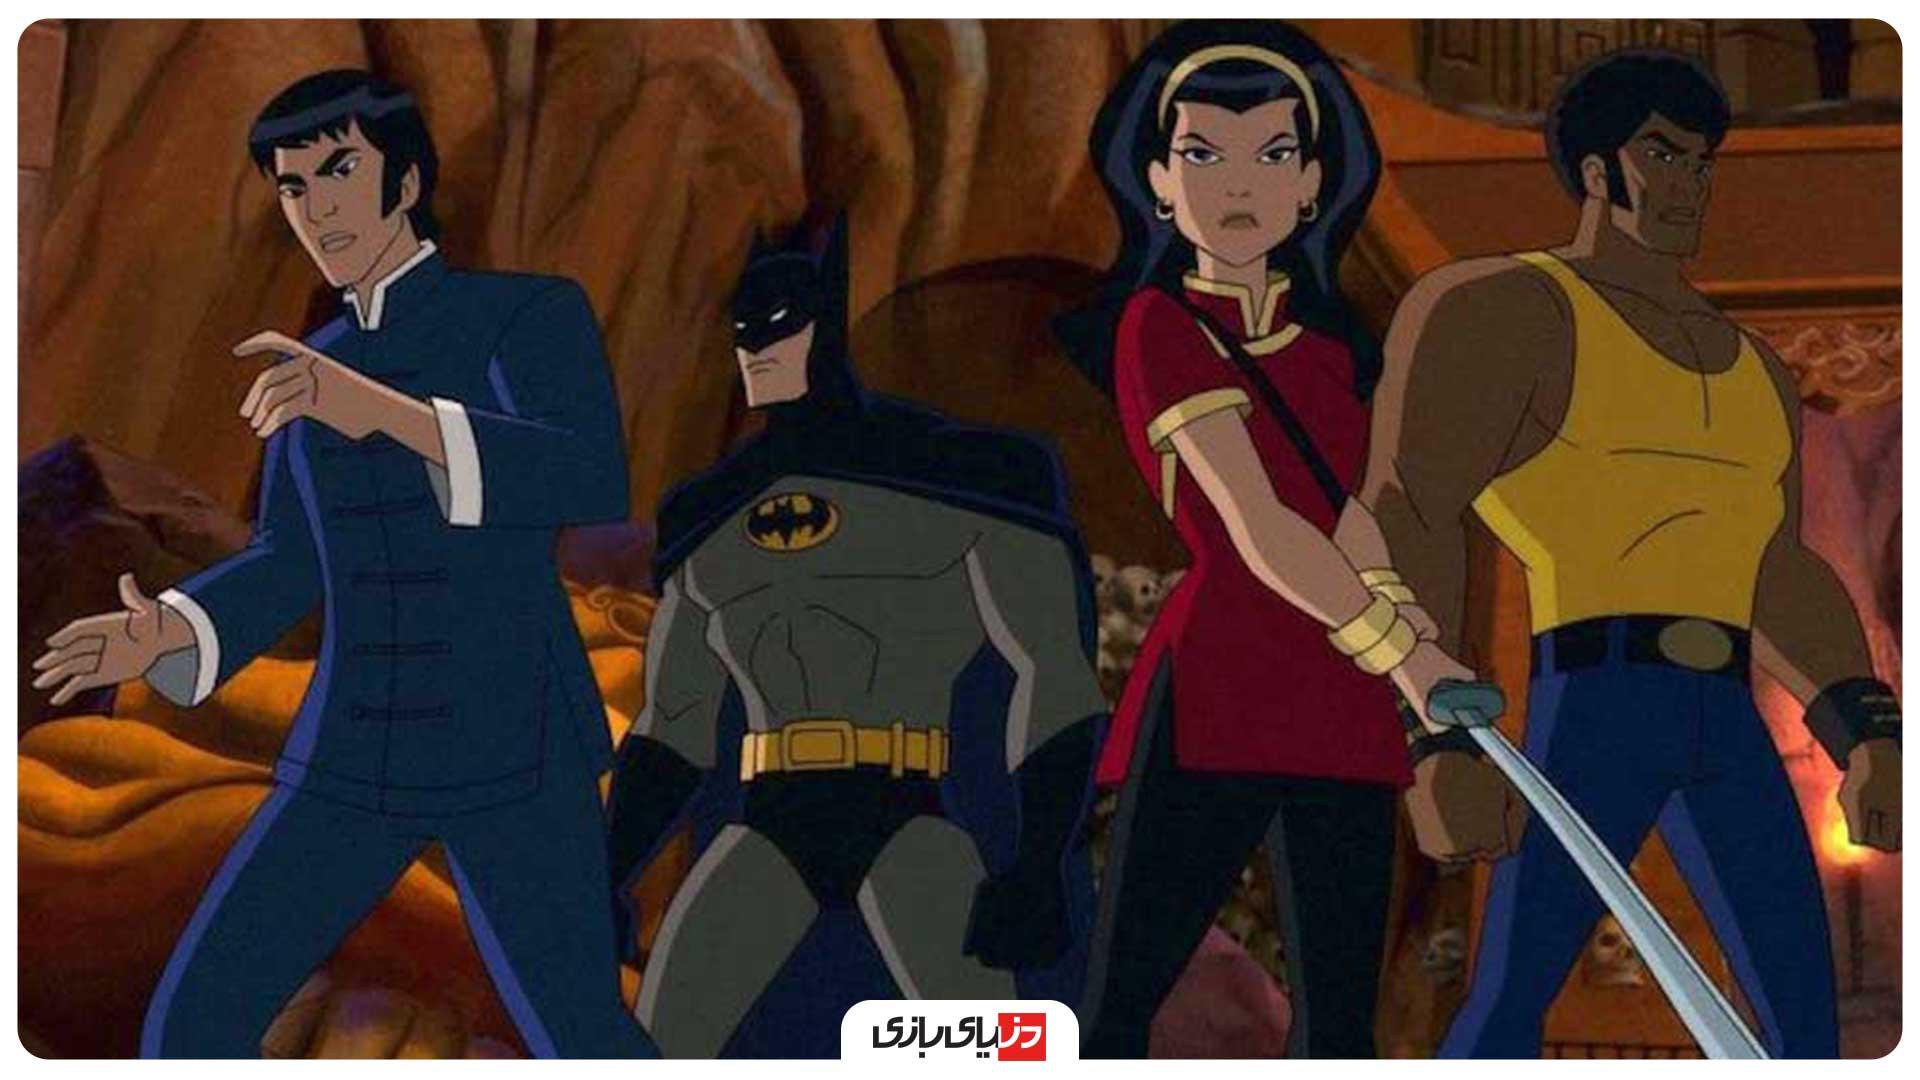 بررسی انیمیشن Batman: Soul of the Dragon